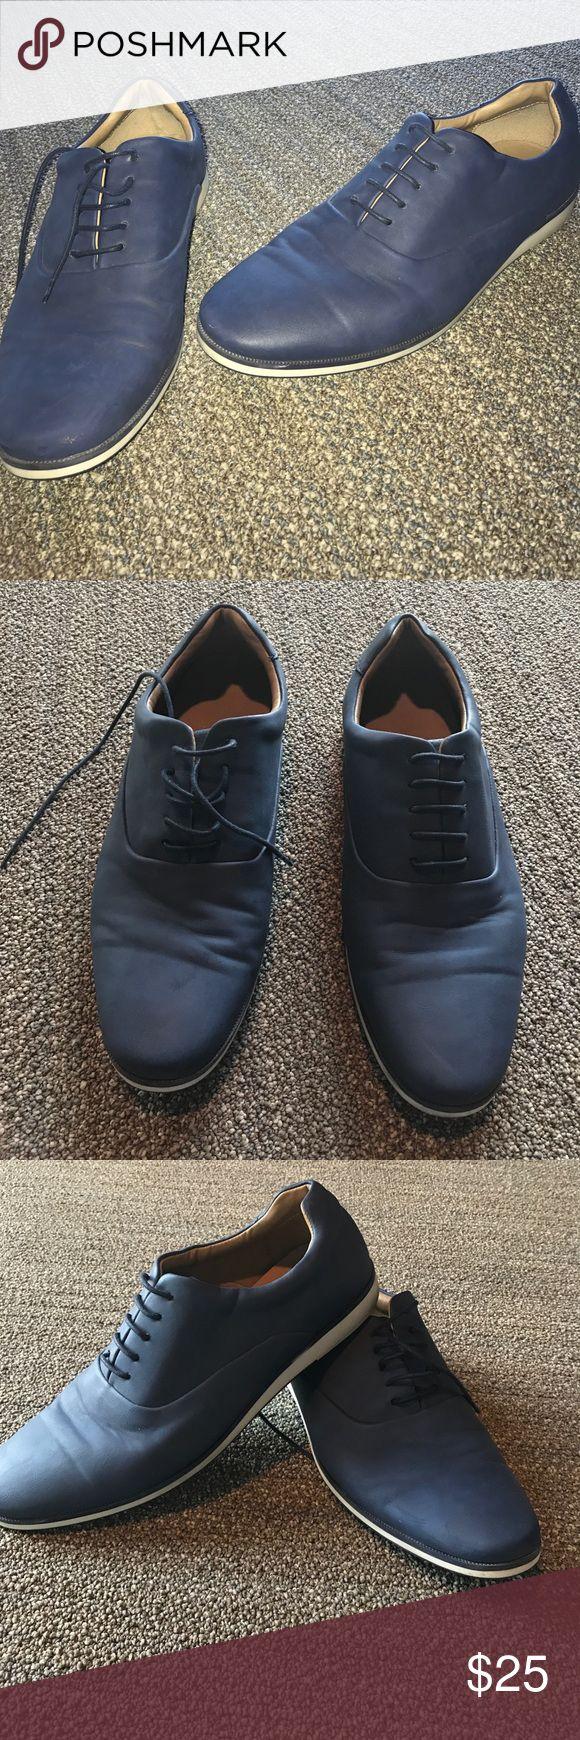 "FLASH🇺🇸SALE Zara Men ""Sporty Shoes"" Sleek blue. Men's size 10.5. Zara size 43 Zara Shoes"